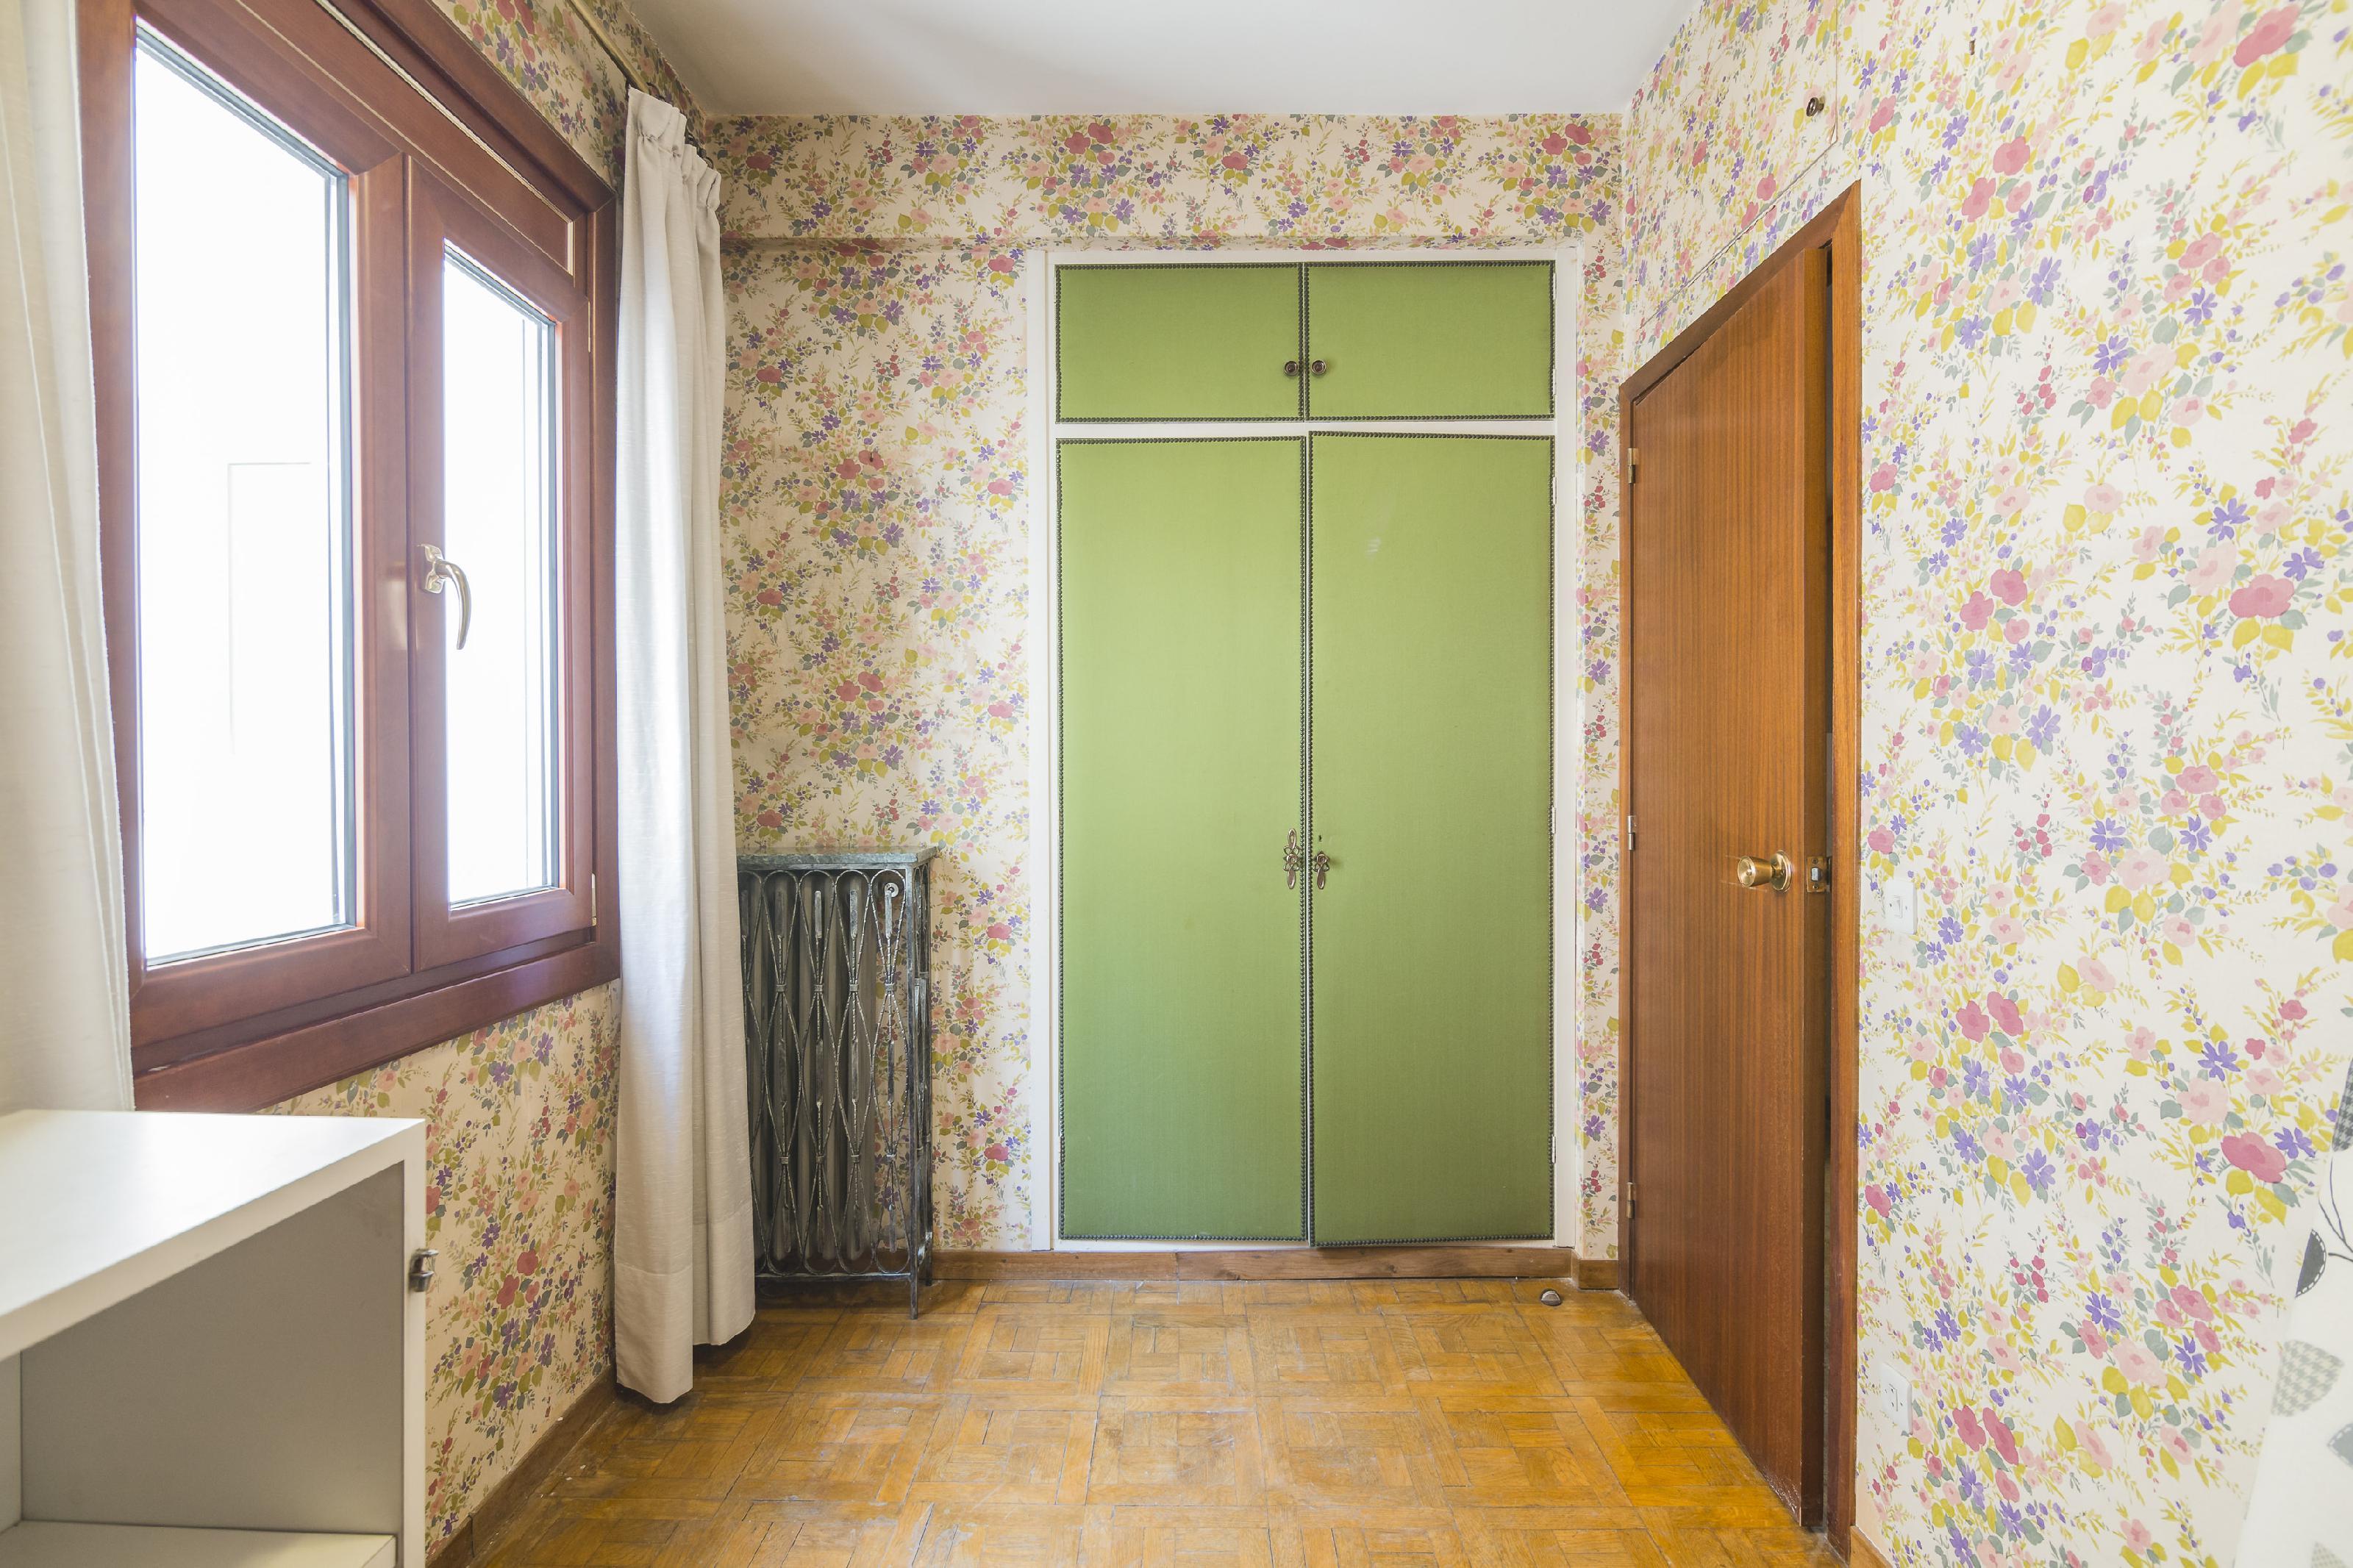 249856 Flat for sale in Sarrià-Sant Gervasi, Sant Gervasi-Galvany 28